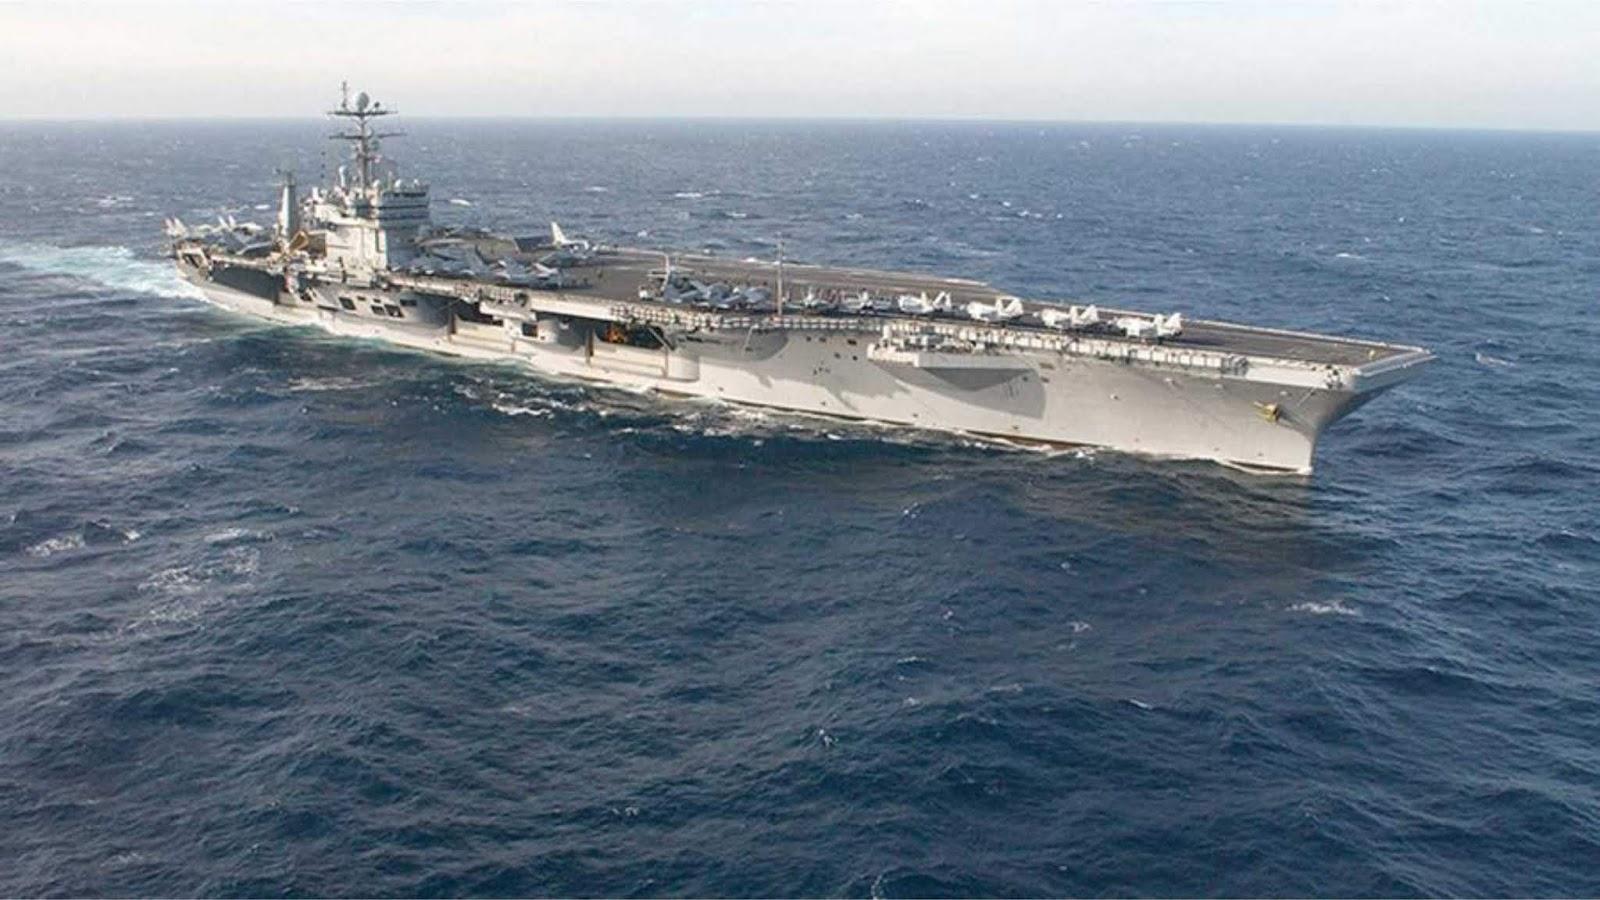 Kapal induk Angkatan Laut AS memasuki Arktik untuk pertama kalinya dalam 30 tahun terakhir